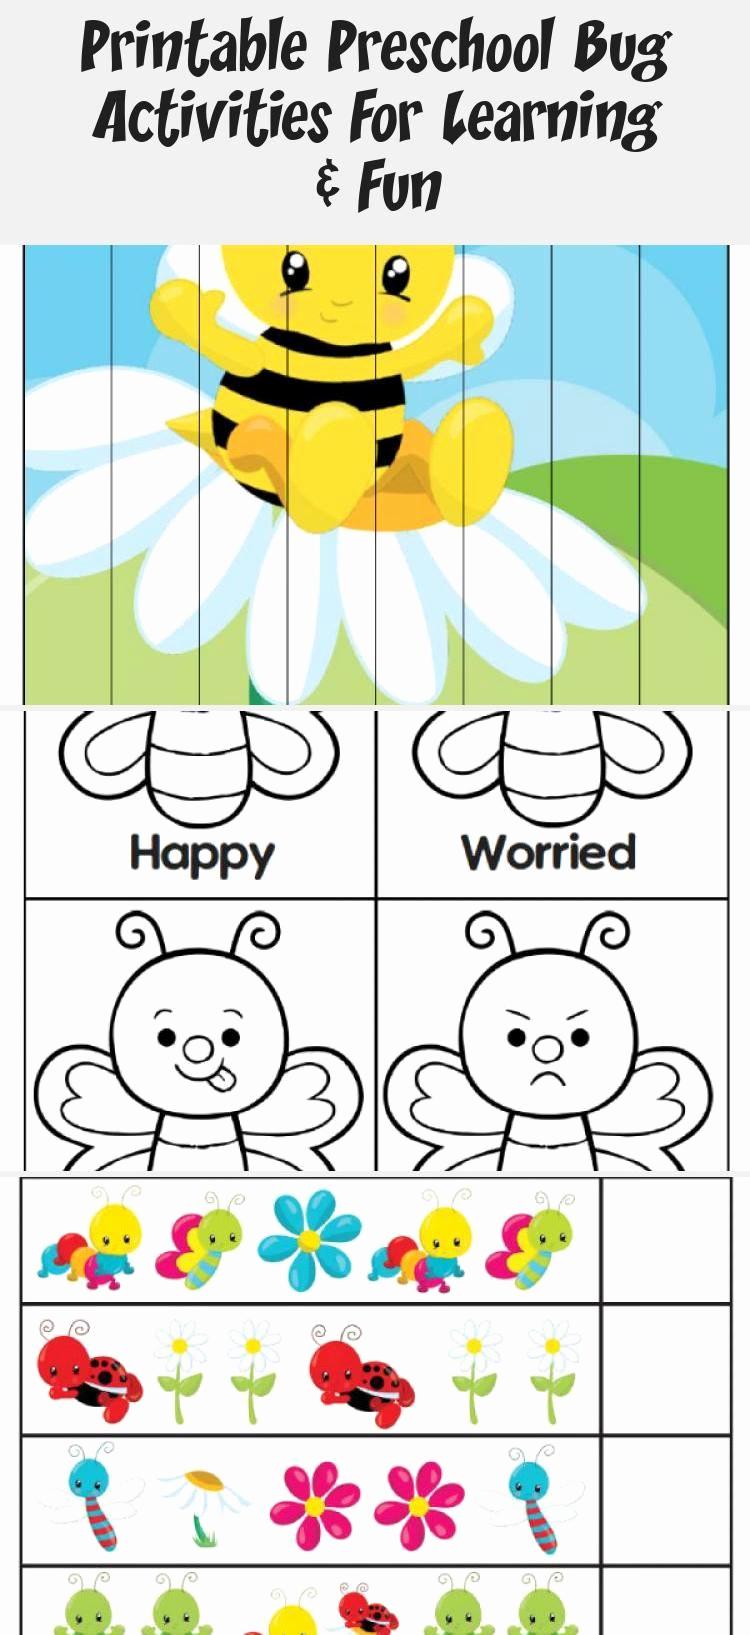 Insect Worksheets for Preschoolers Elegant 30 Preschool Bug and Insect Worksheets Coloring Style